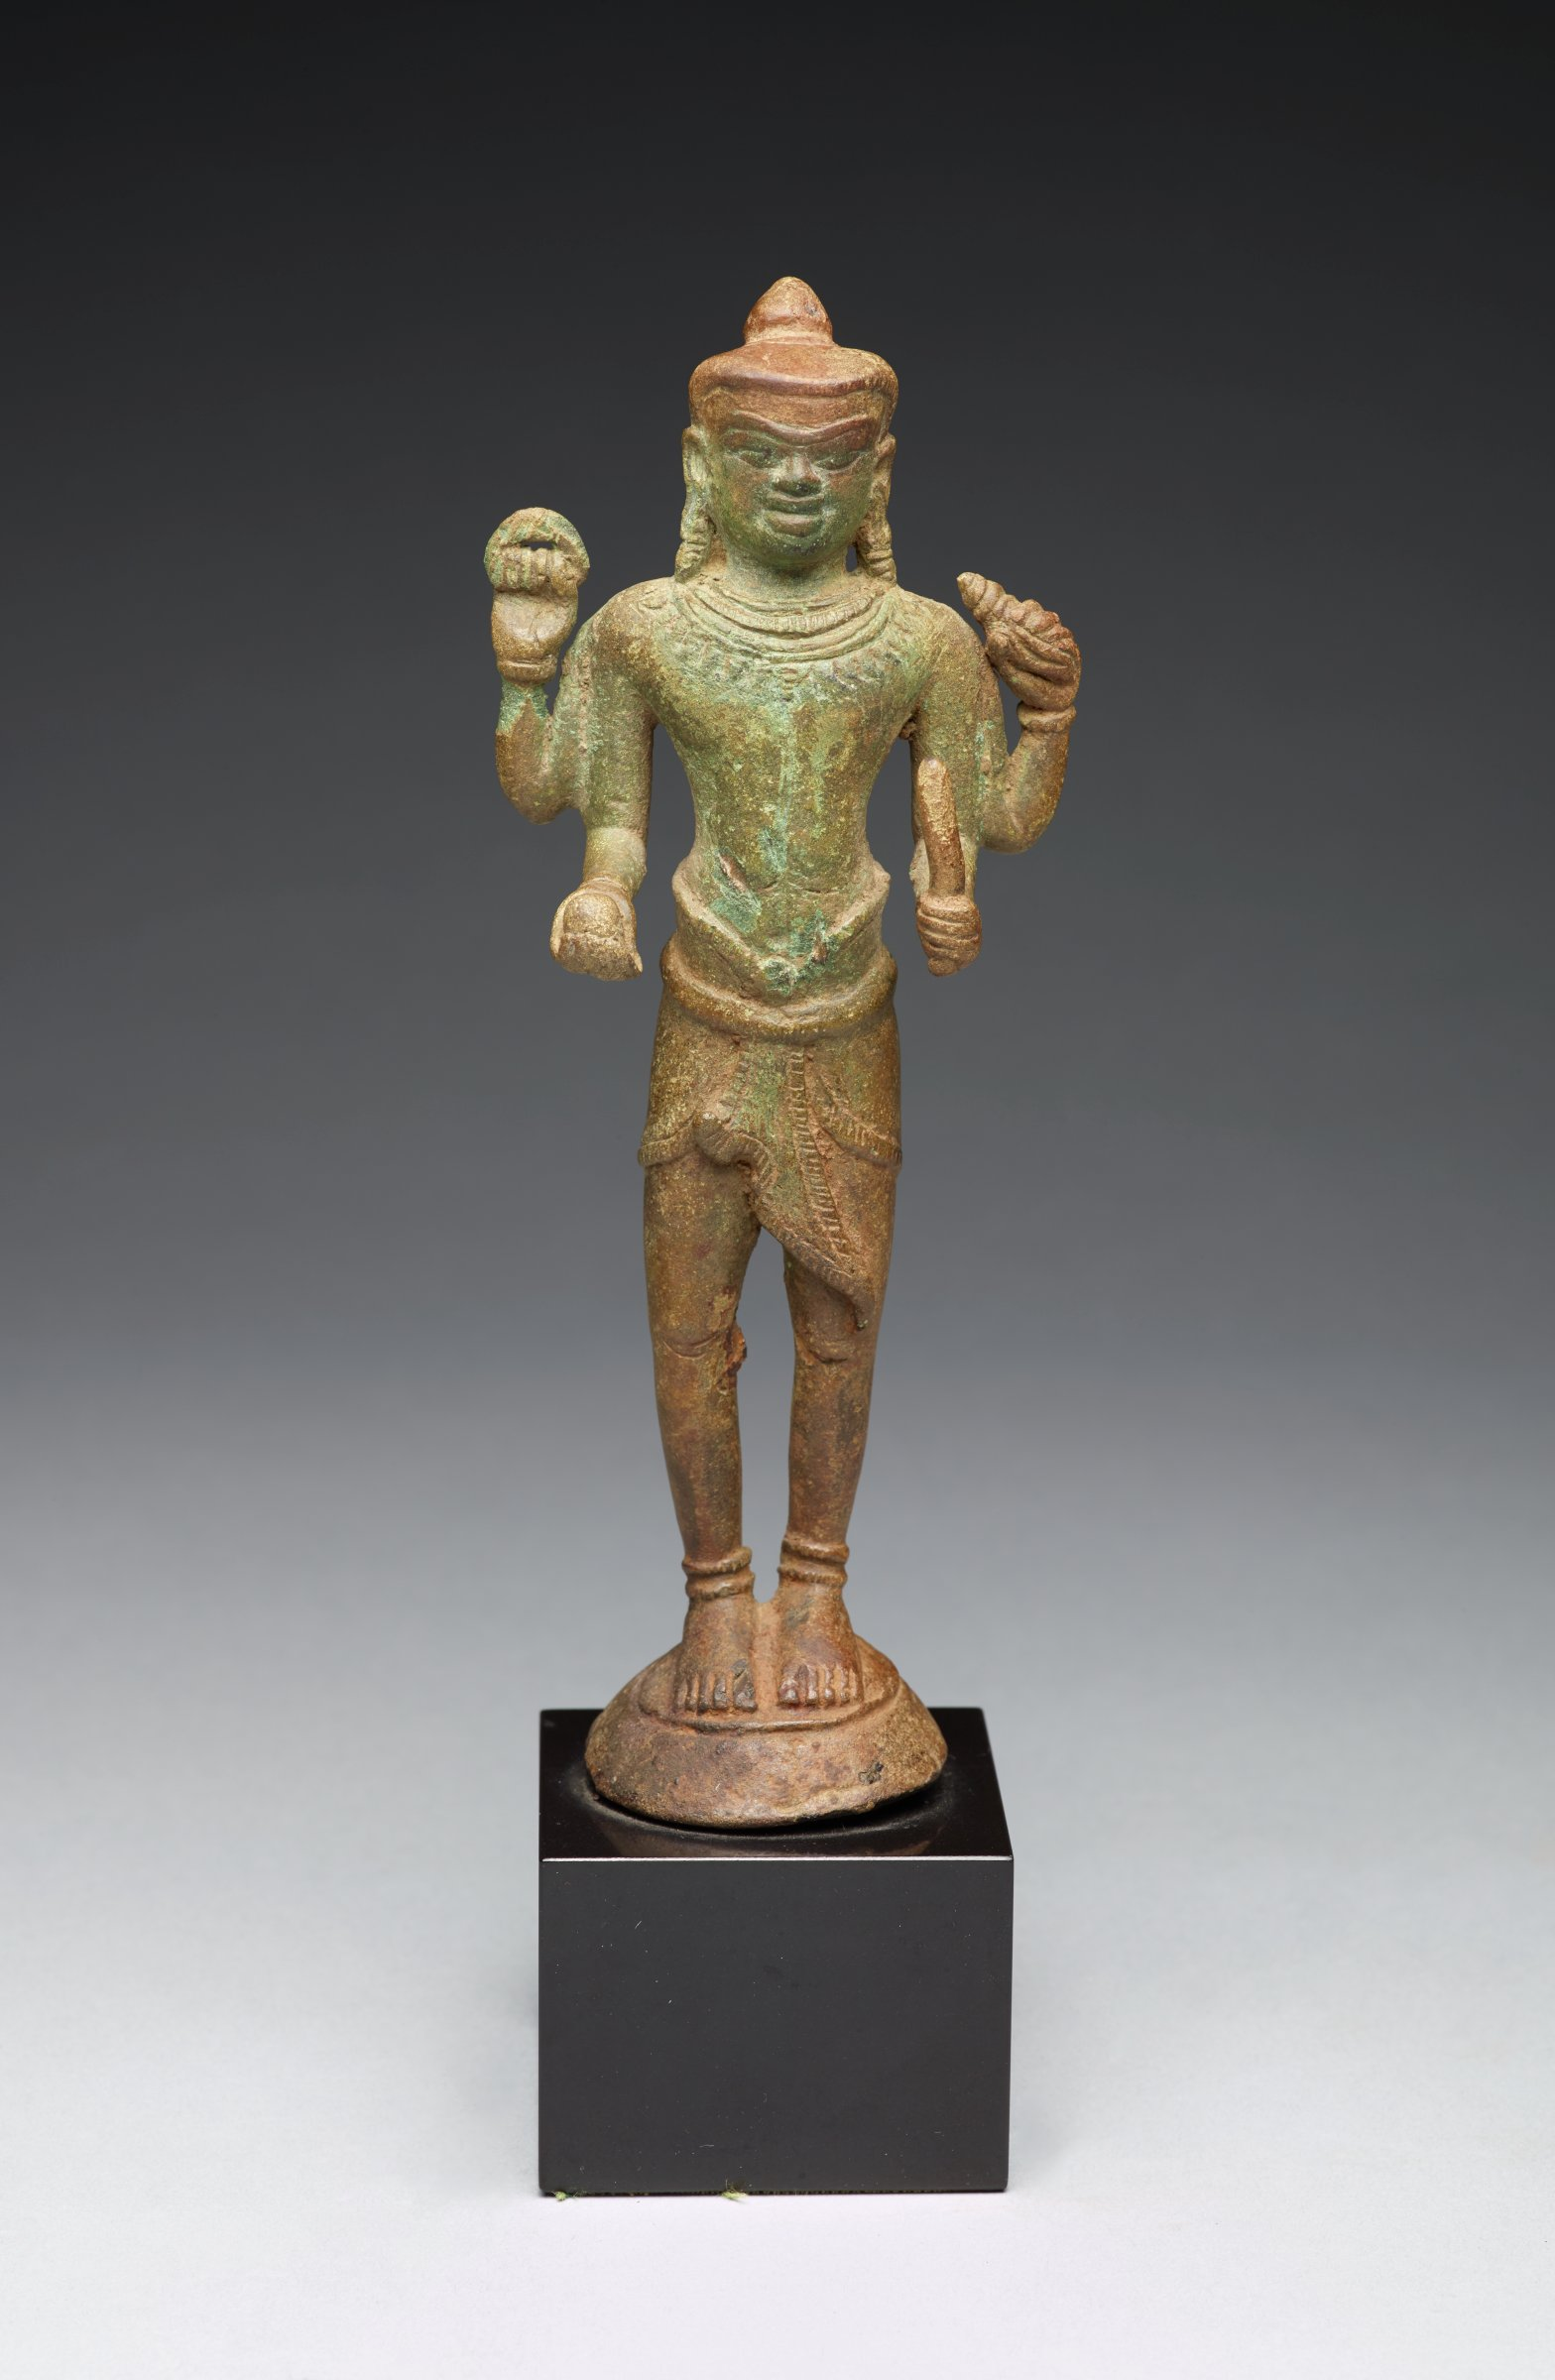 Four-Armed Standing Vishnu with short sarong